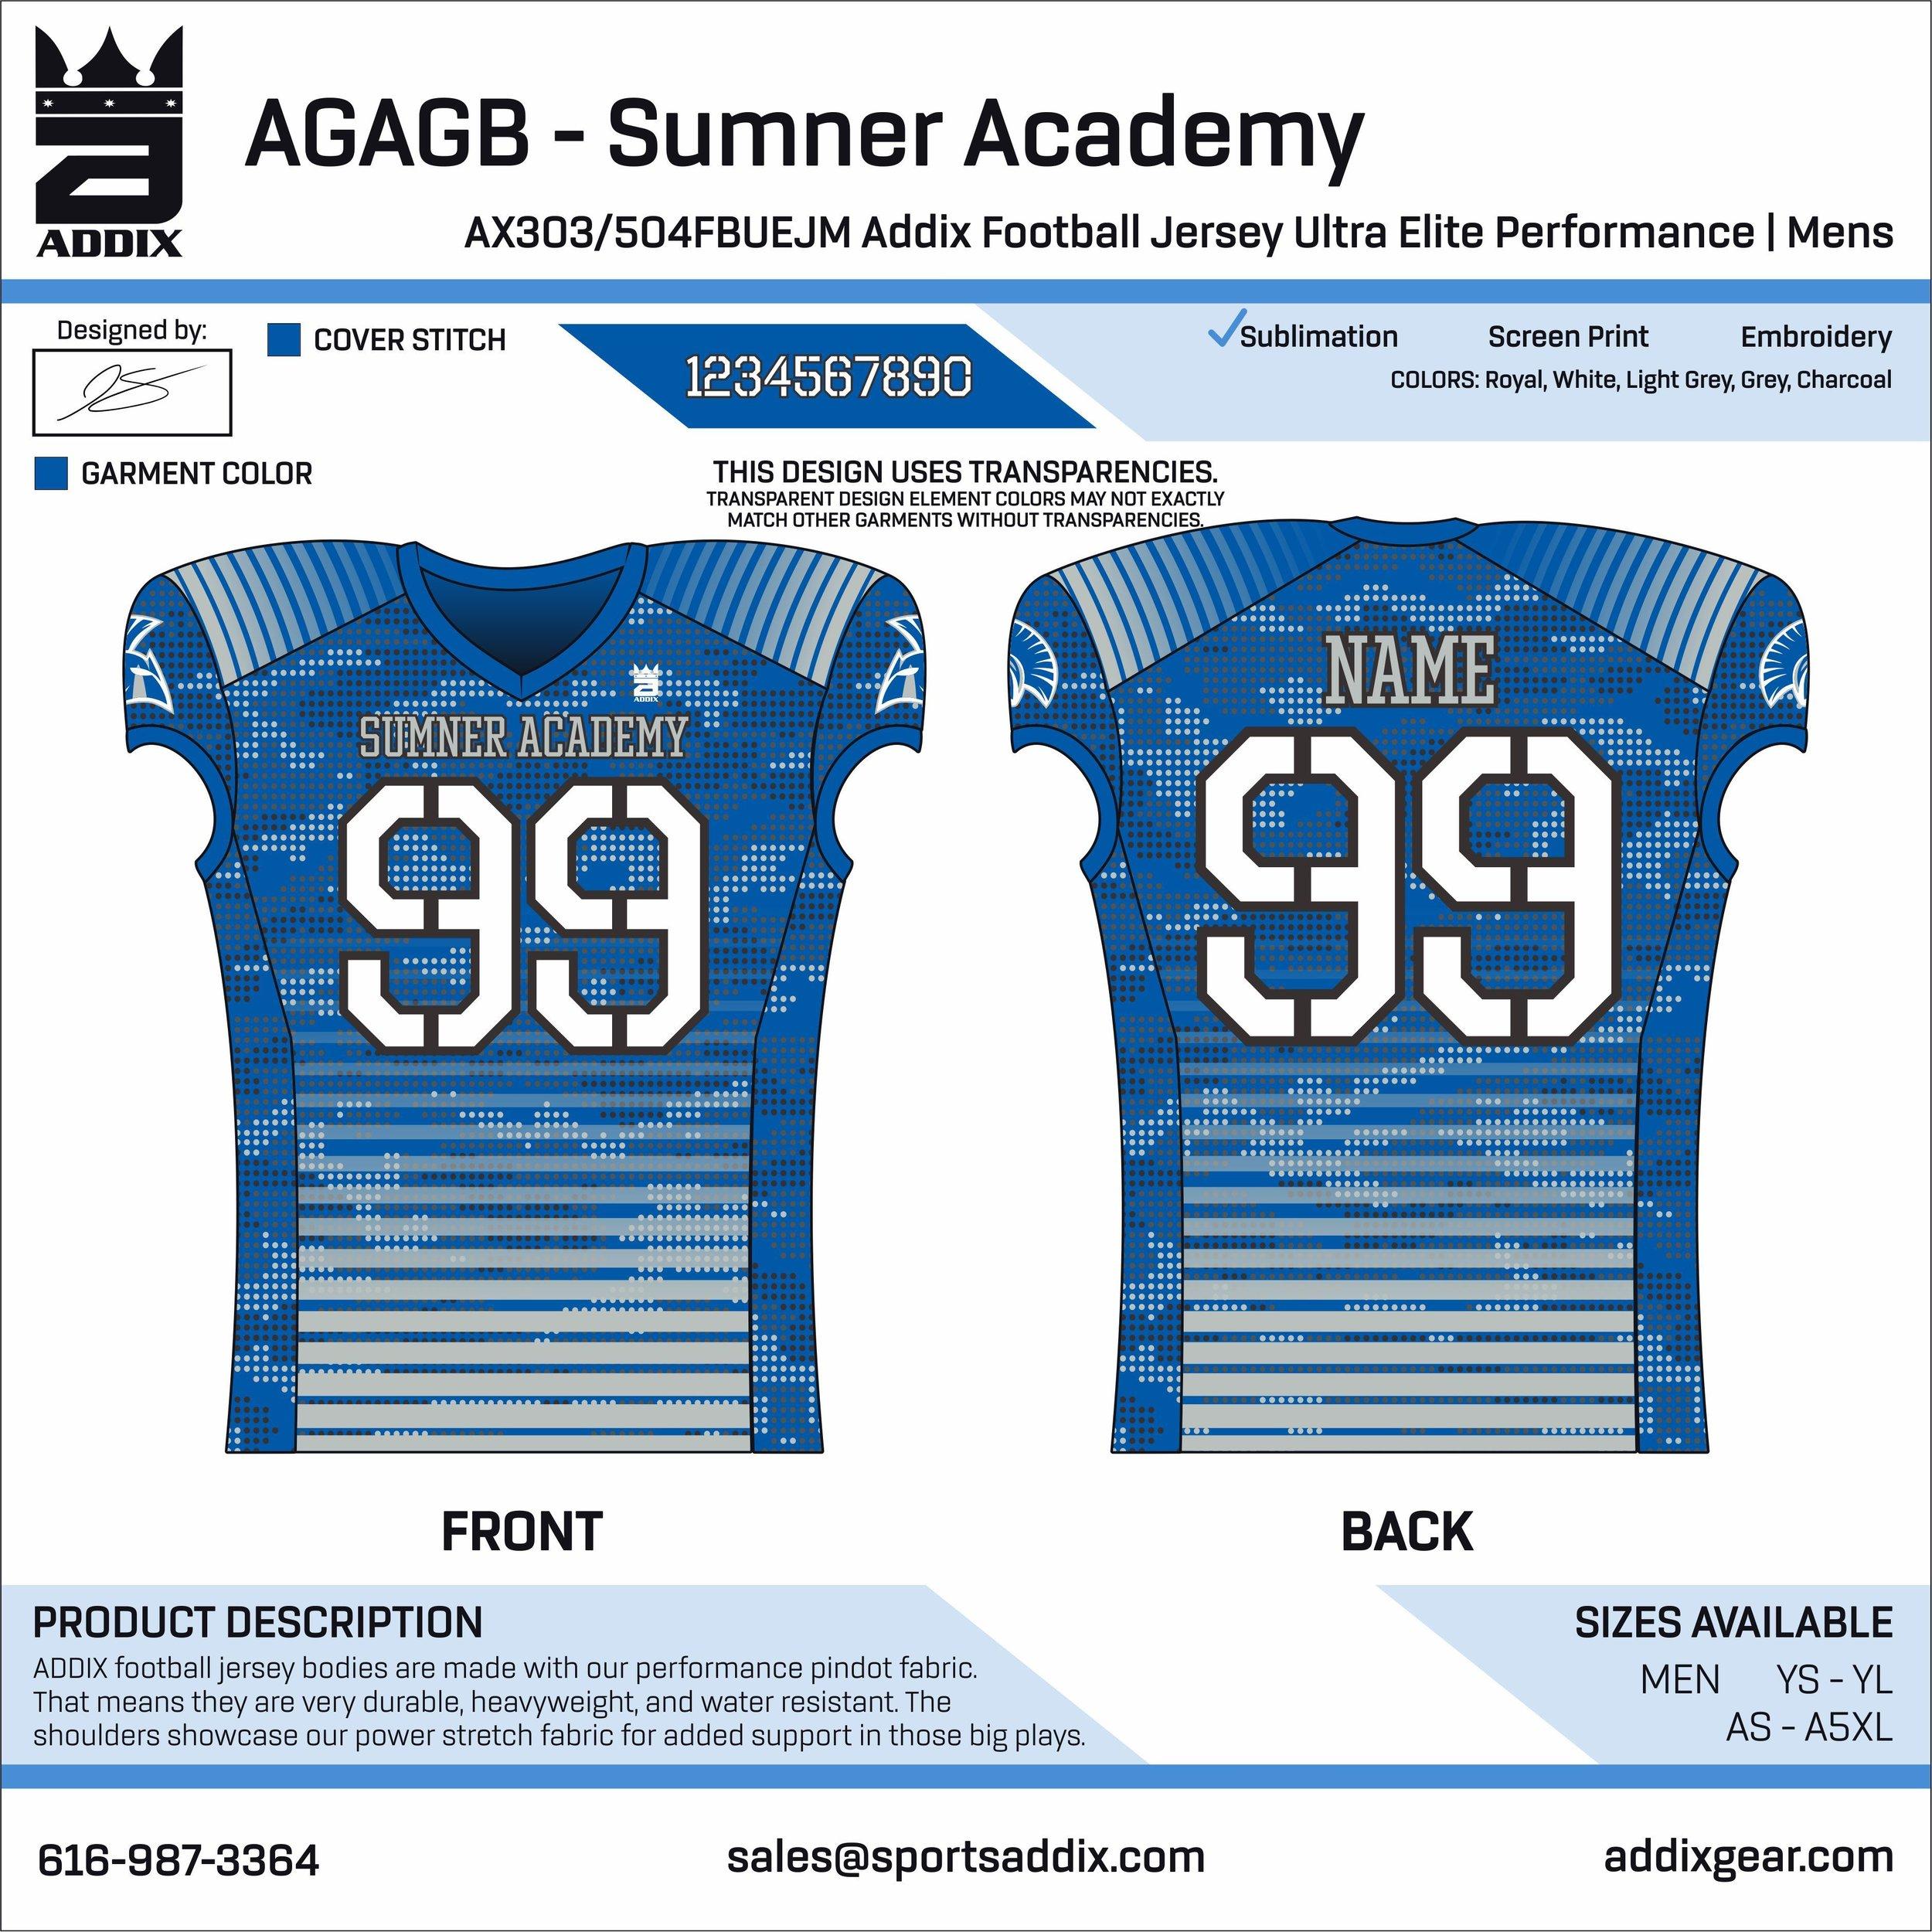 AGAGB - Sumner Academy_2018_7-23_JE_UEP Football Jersey.jpg